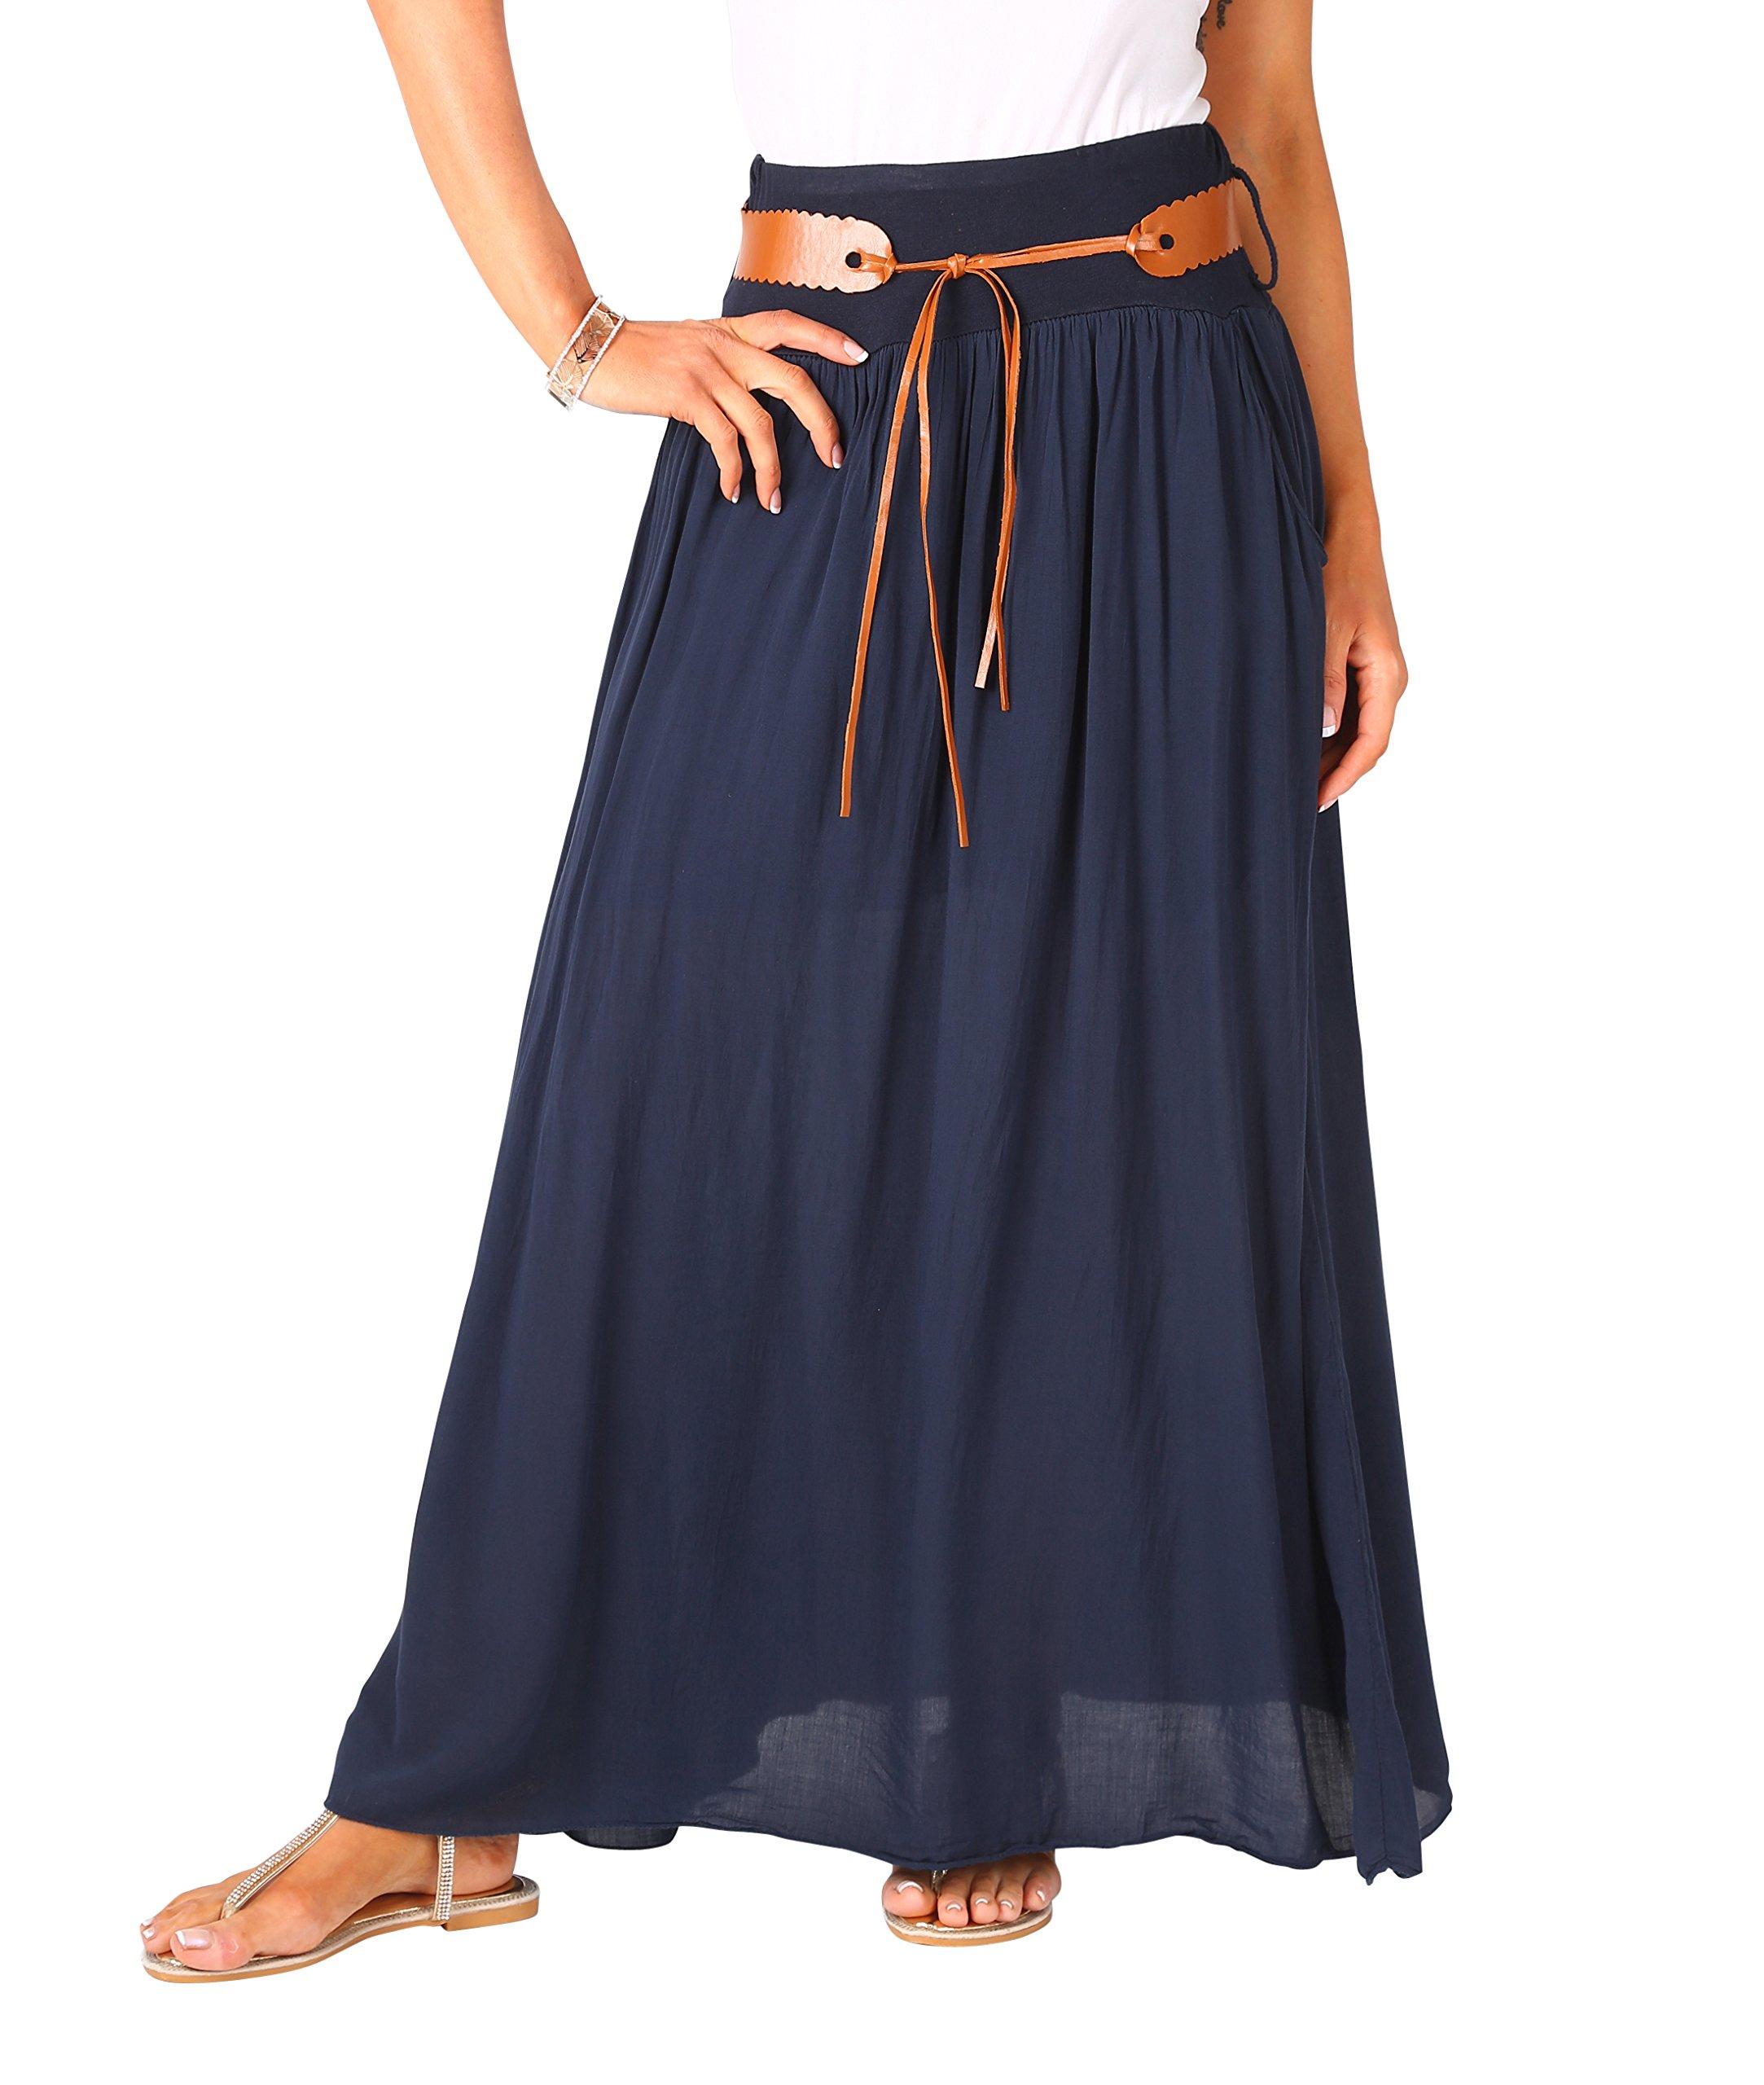 KRISP Falda Larga Mujer Boho Cintura Talla Grande Verano 2018 Plisada